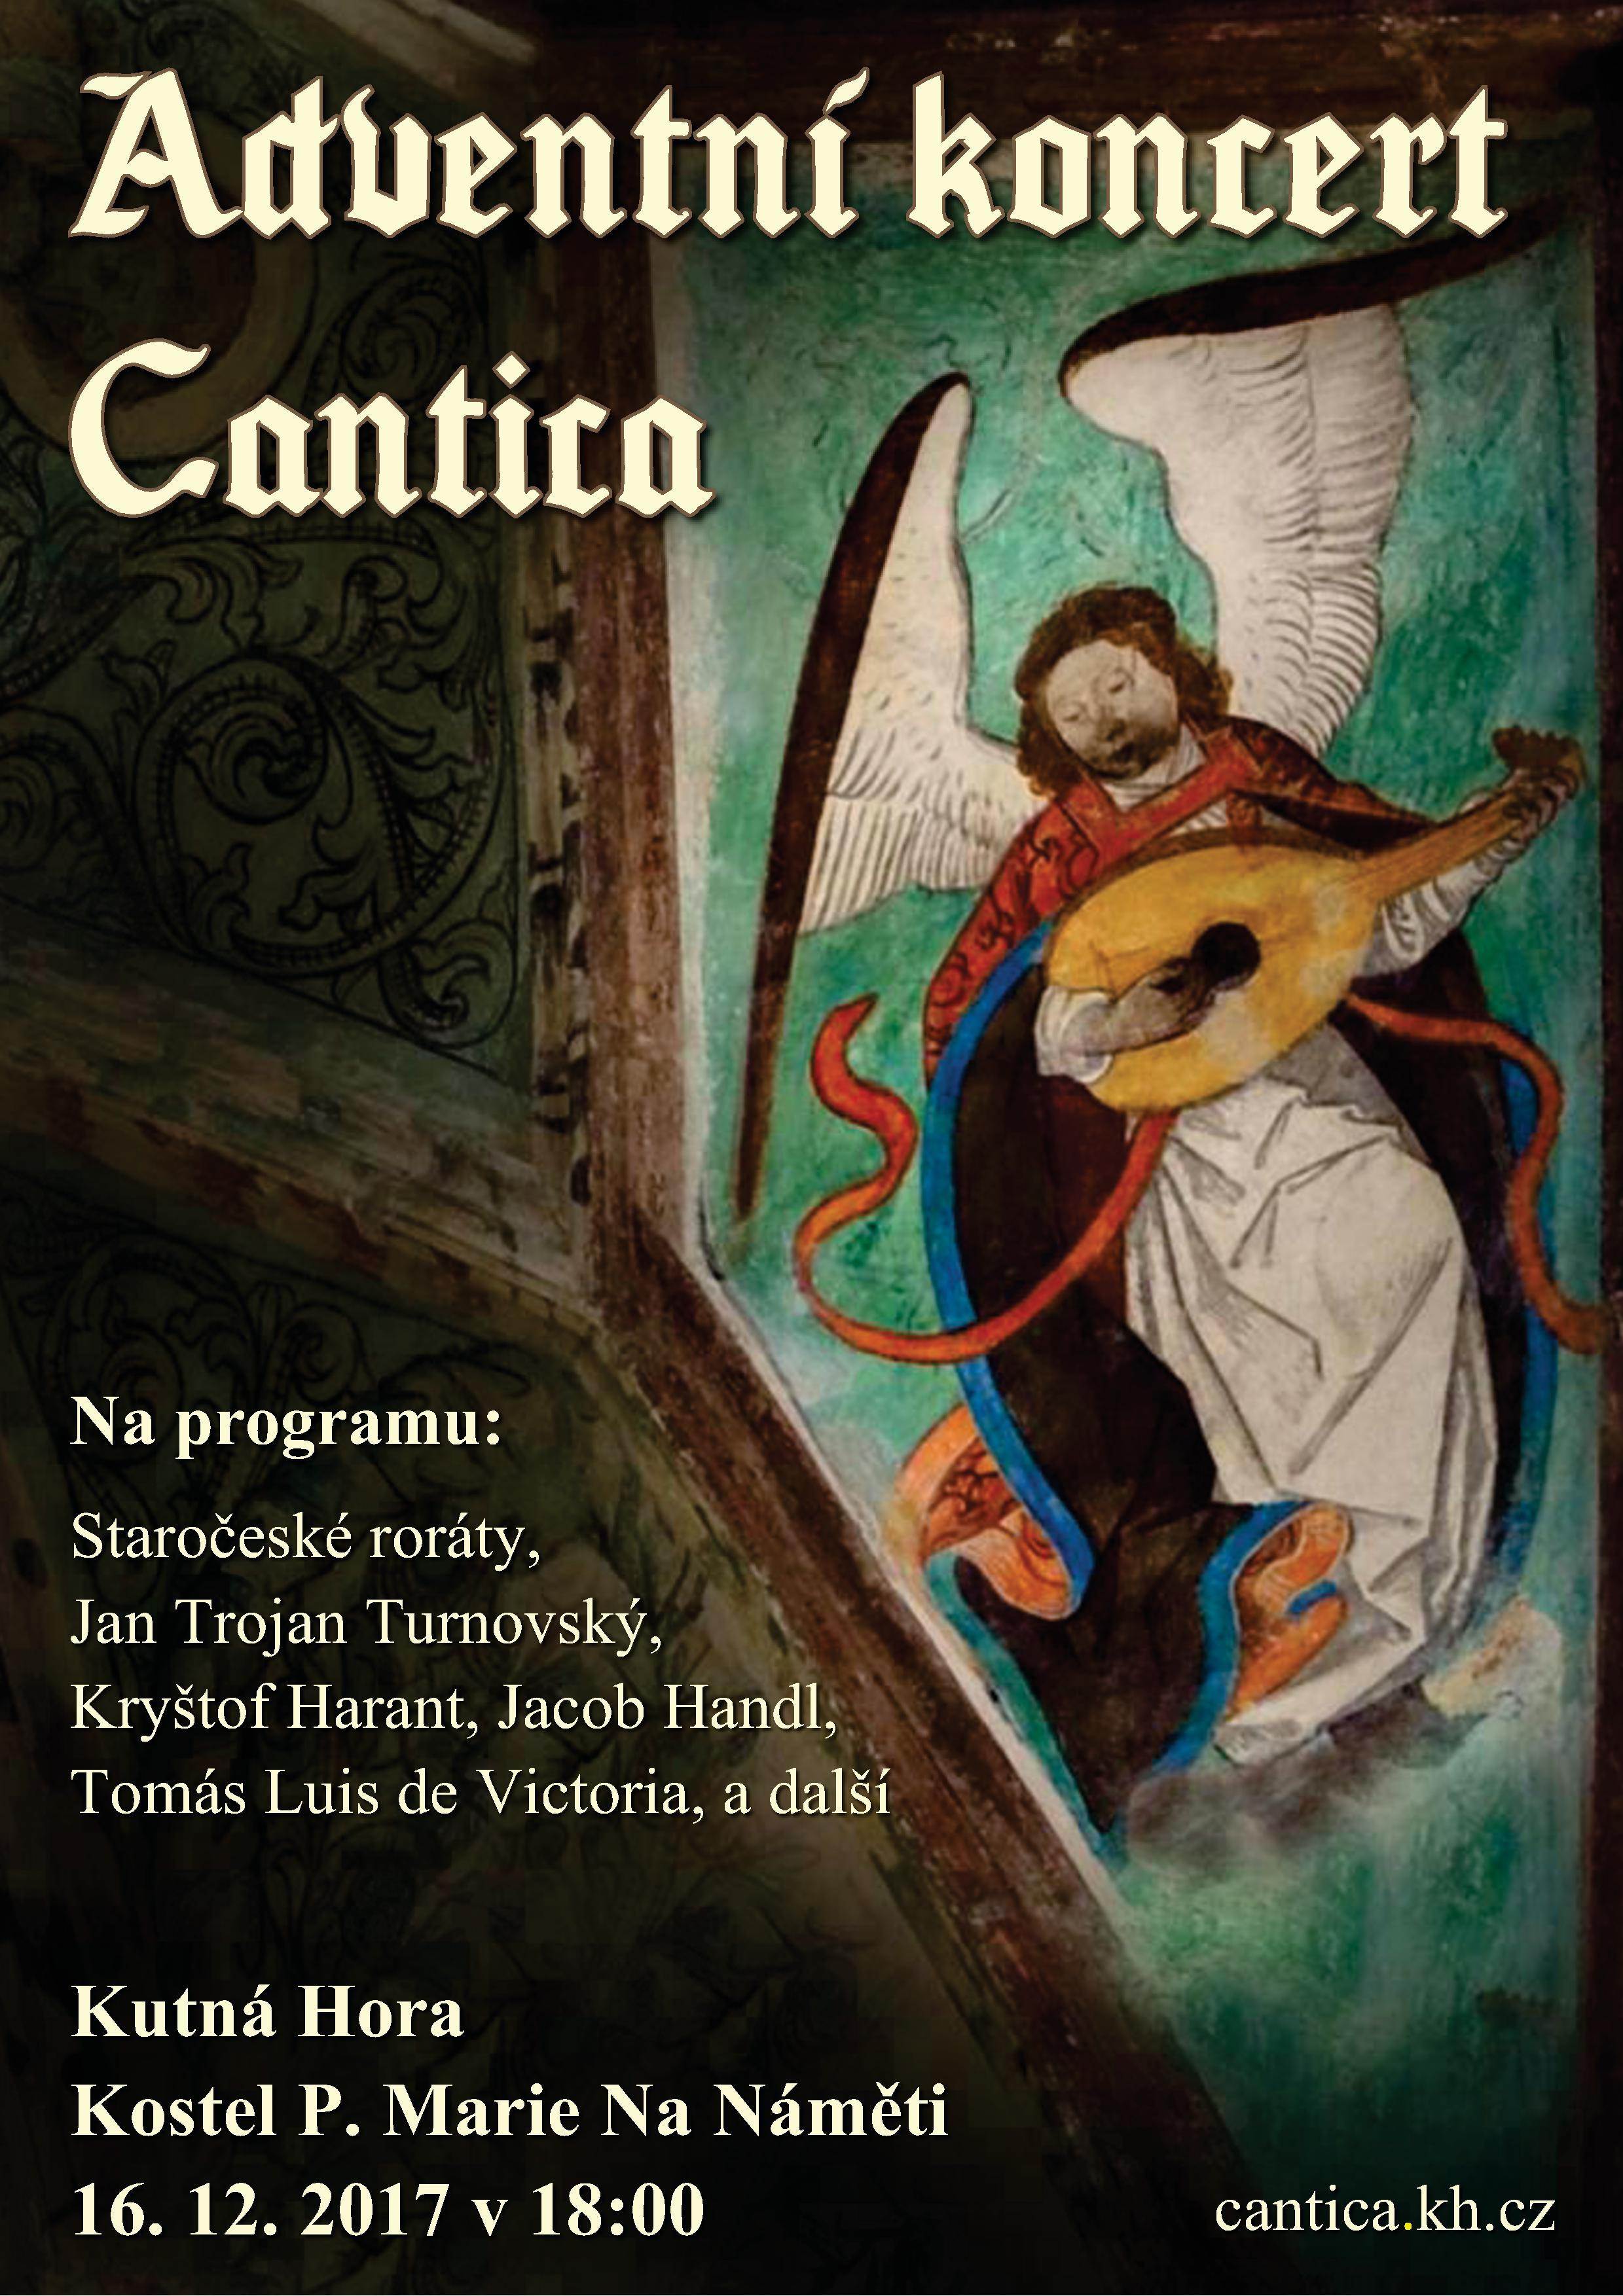 2955-171216-adventni-koncert-cantica-16-12-2017.jpg